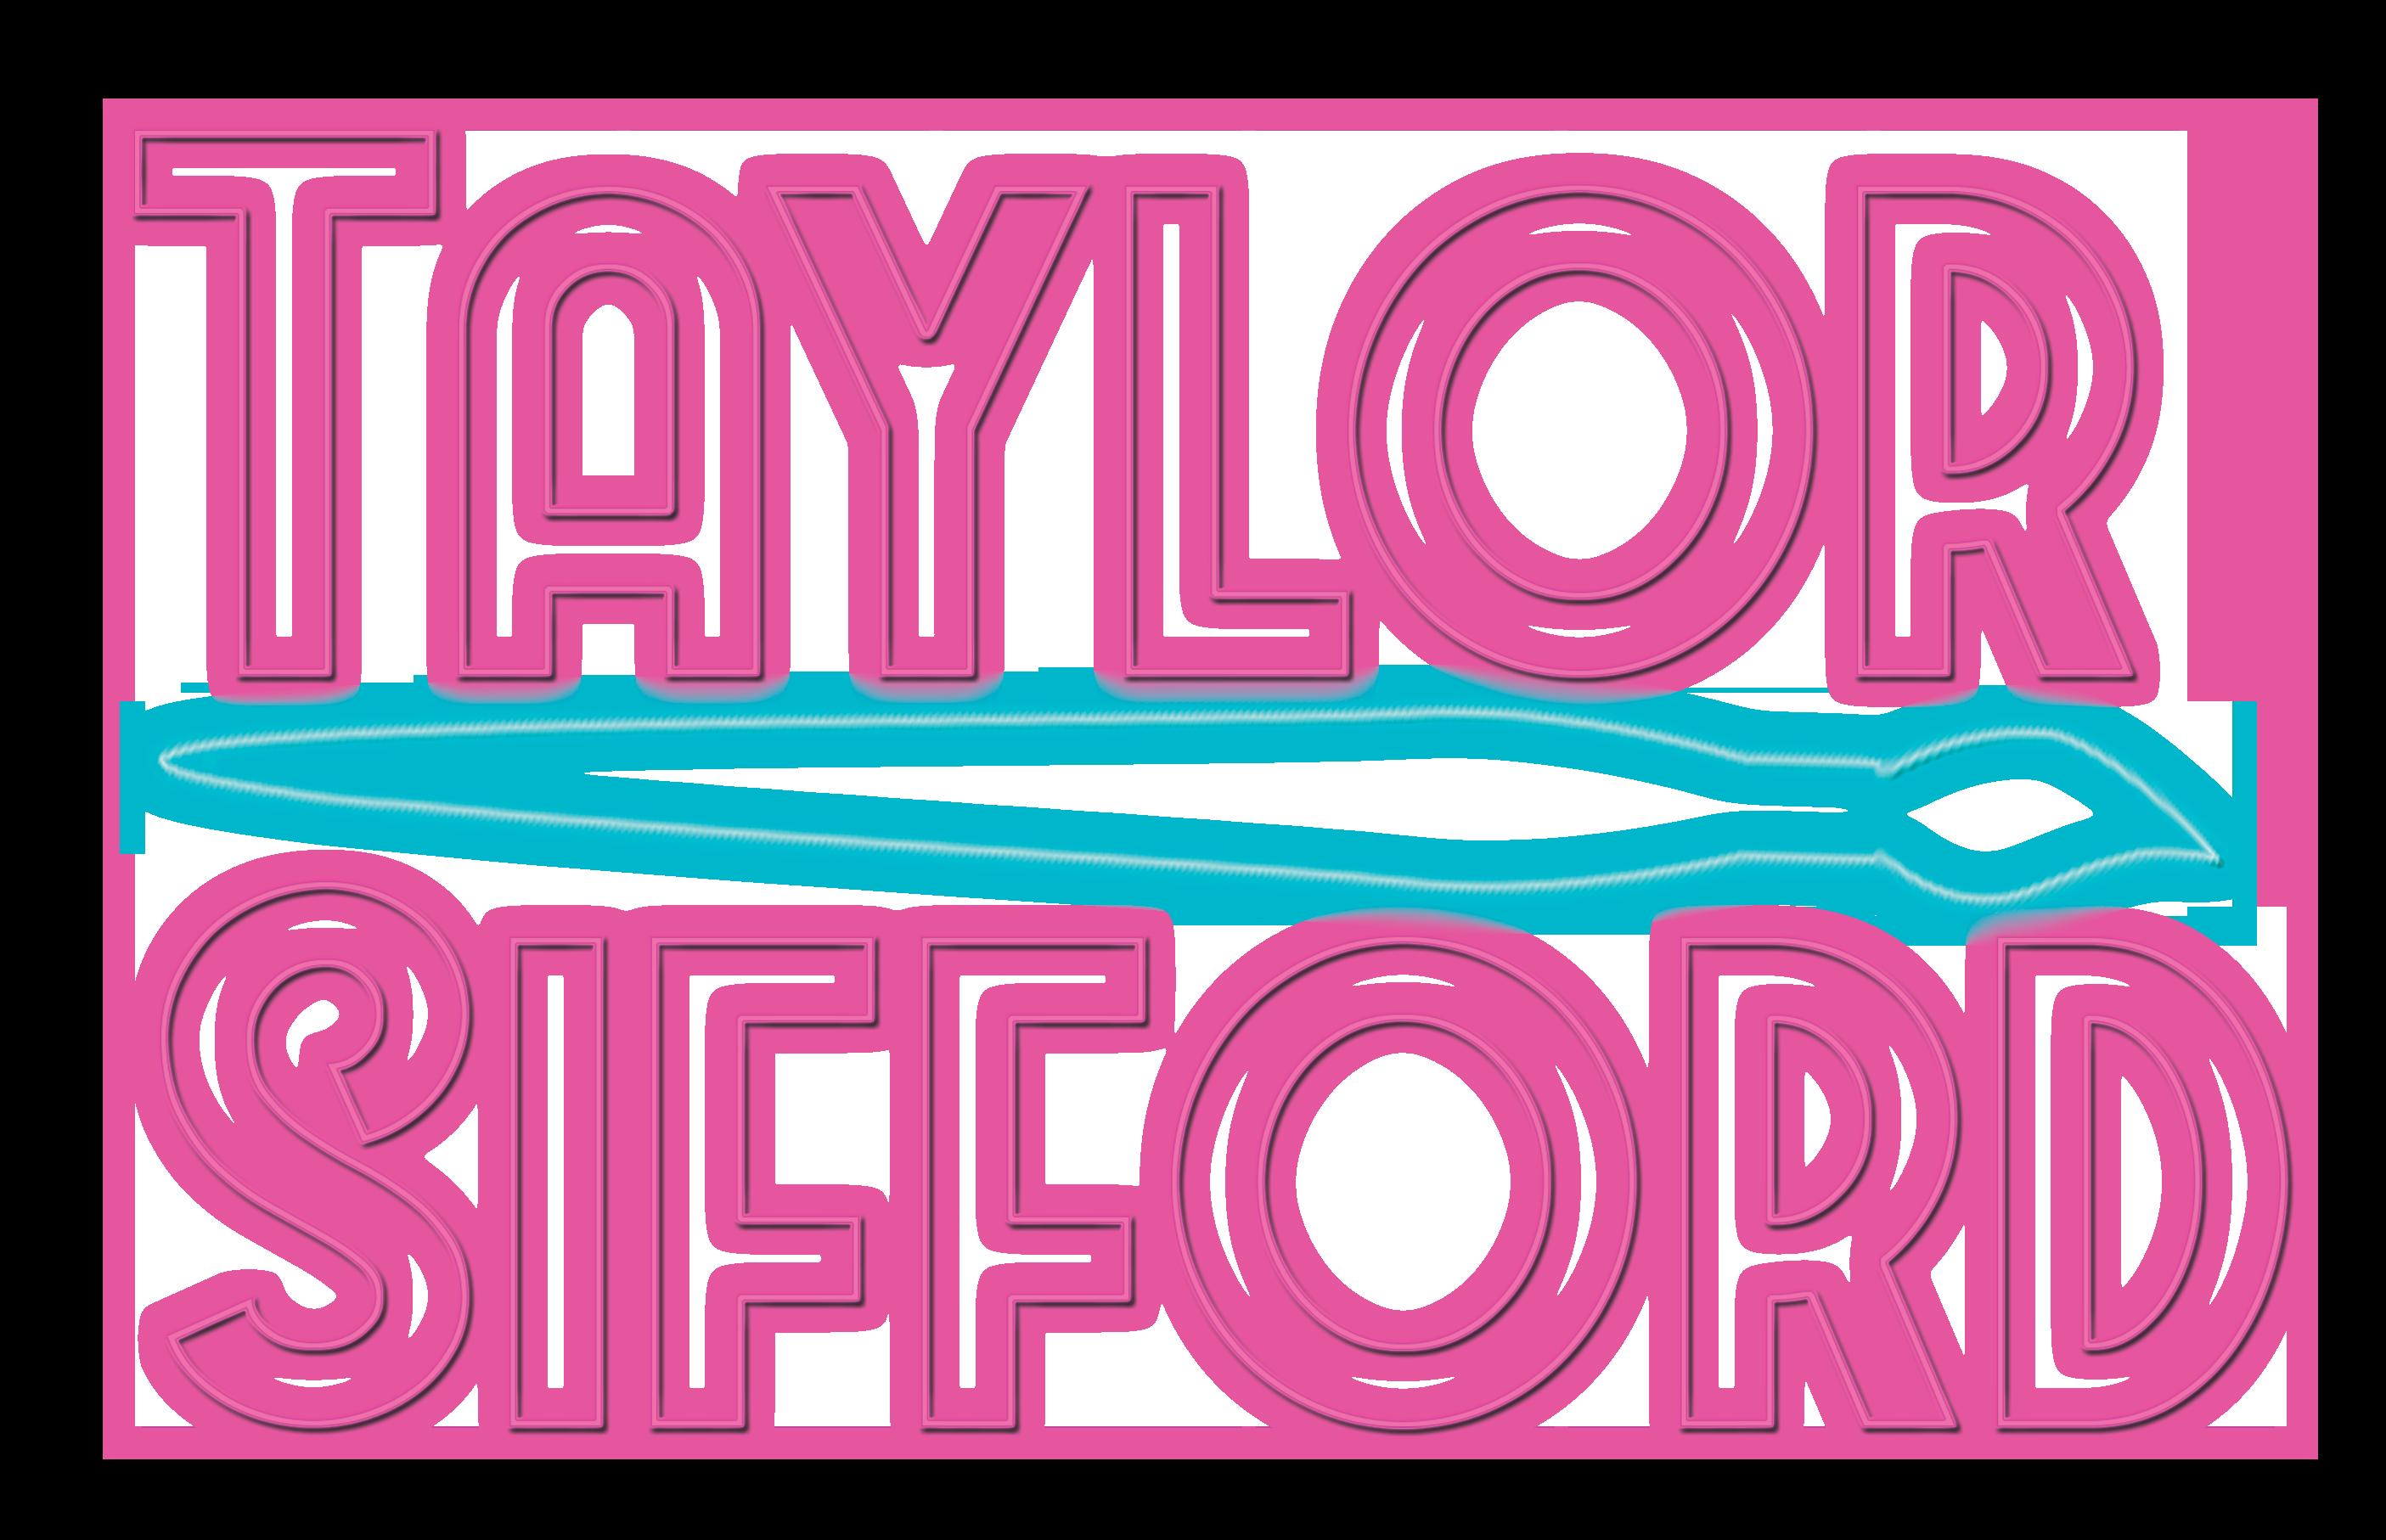 Taylor Sifford